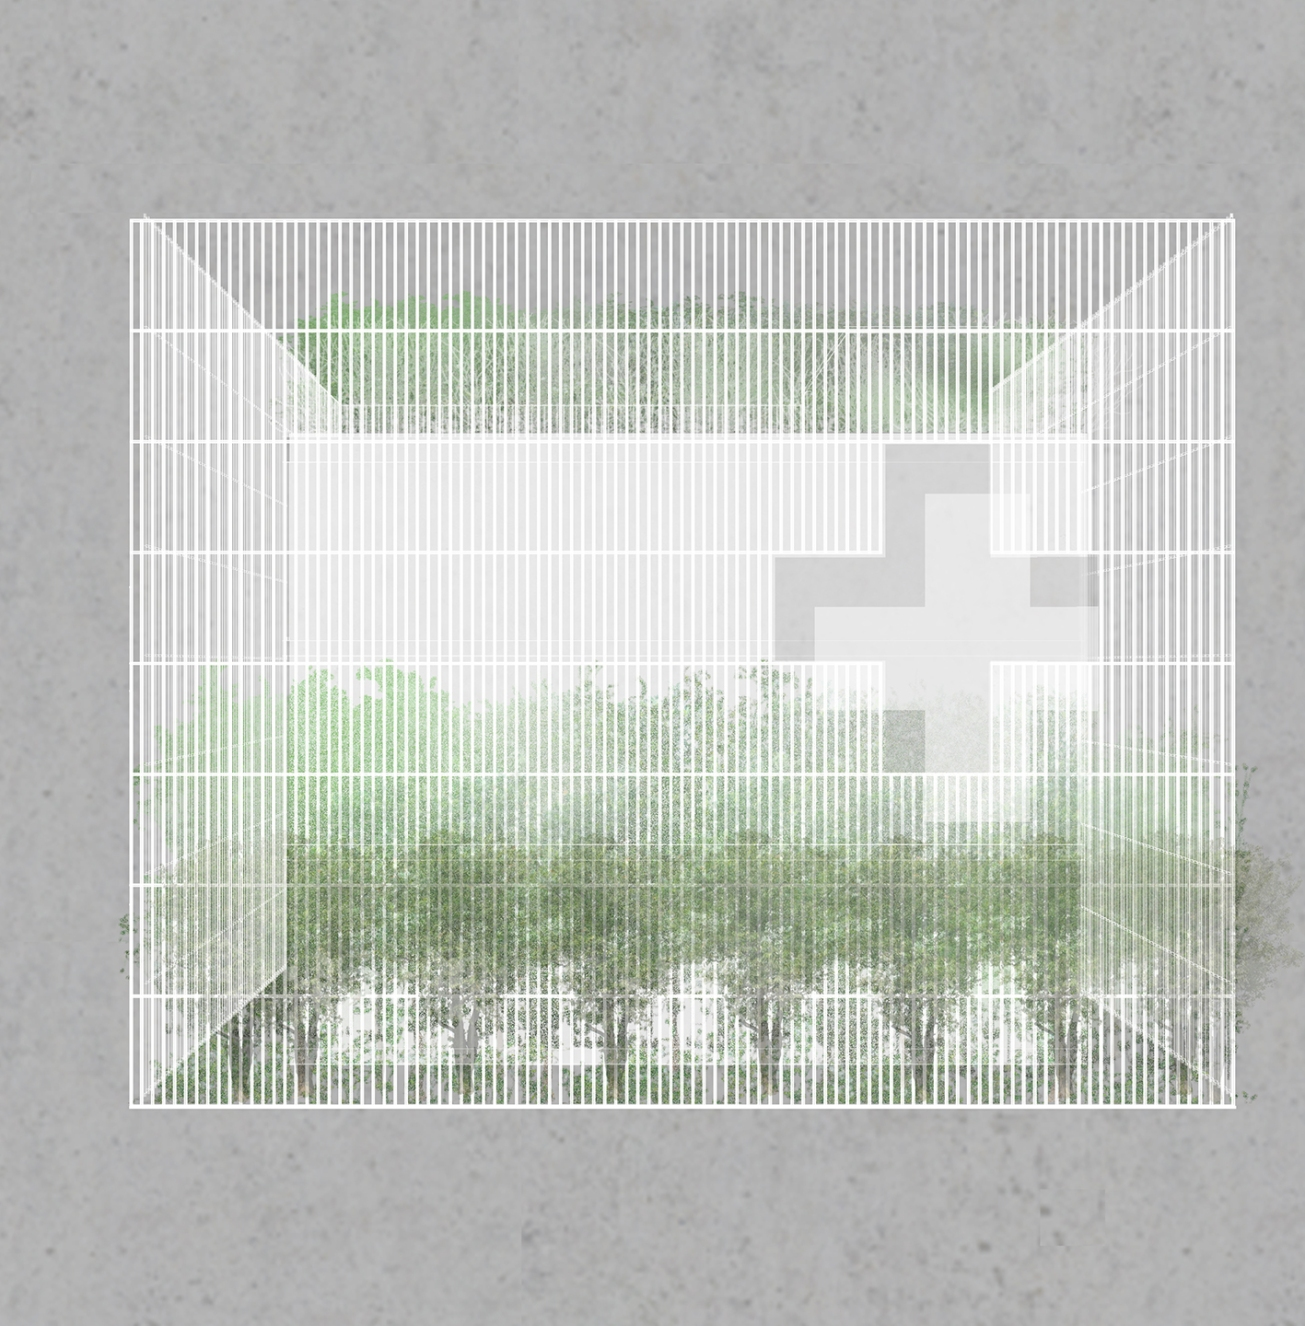 4_elzbieta-komendacka_wroclaw-univeristy-of-technology_architecture_master